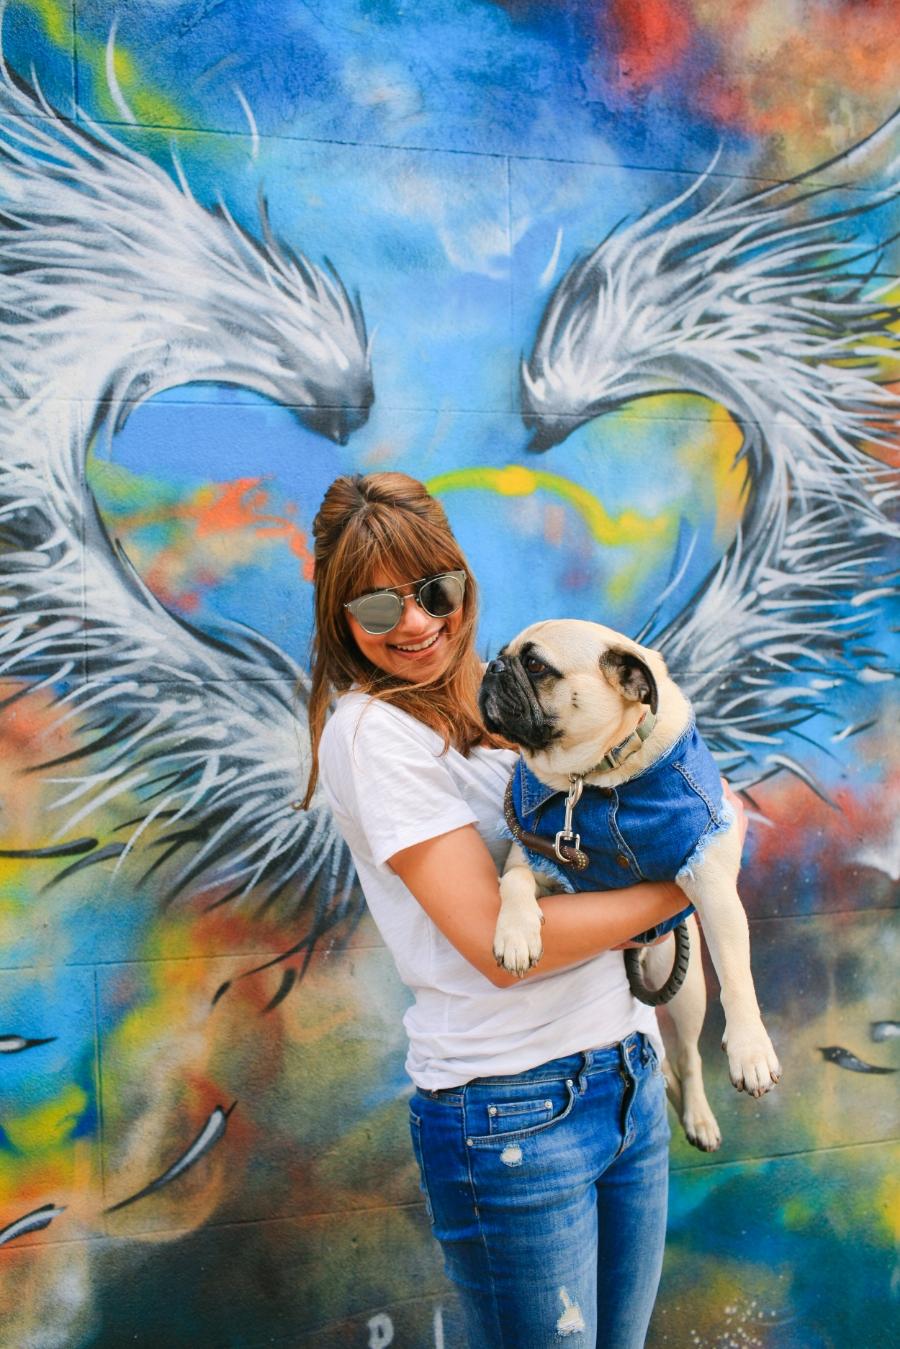 dogblog-petfashionblog-denim-pethaus-denimfordogs-streetart-london-humanandhound-coolpups-dogsinclothes-pugswag-honeyidressedthepug-shoreditch-